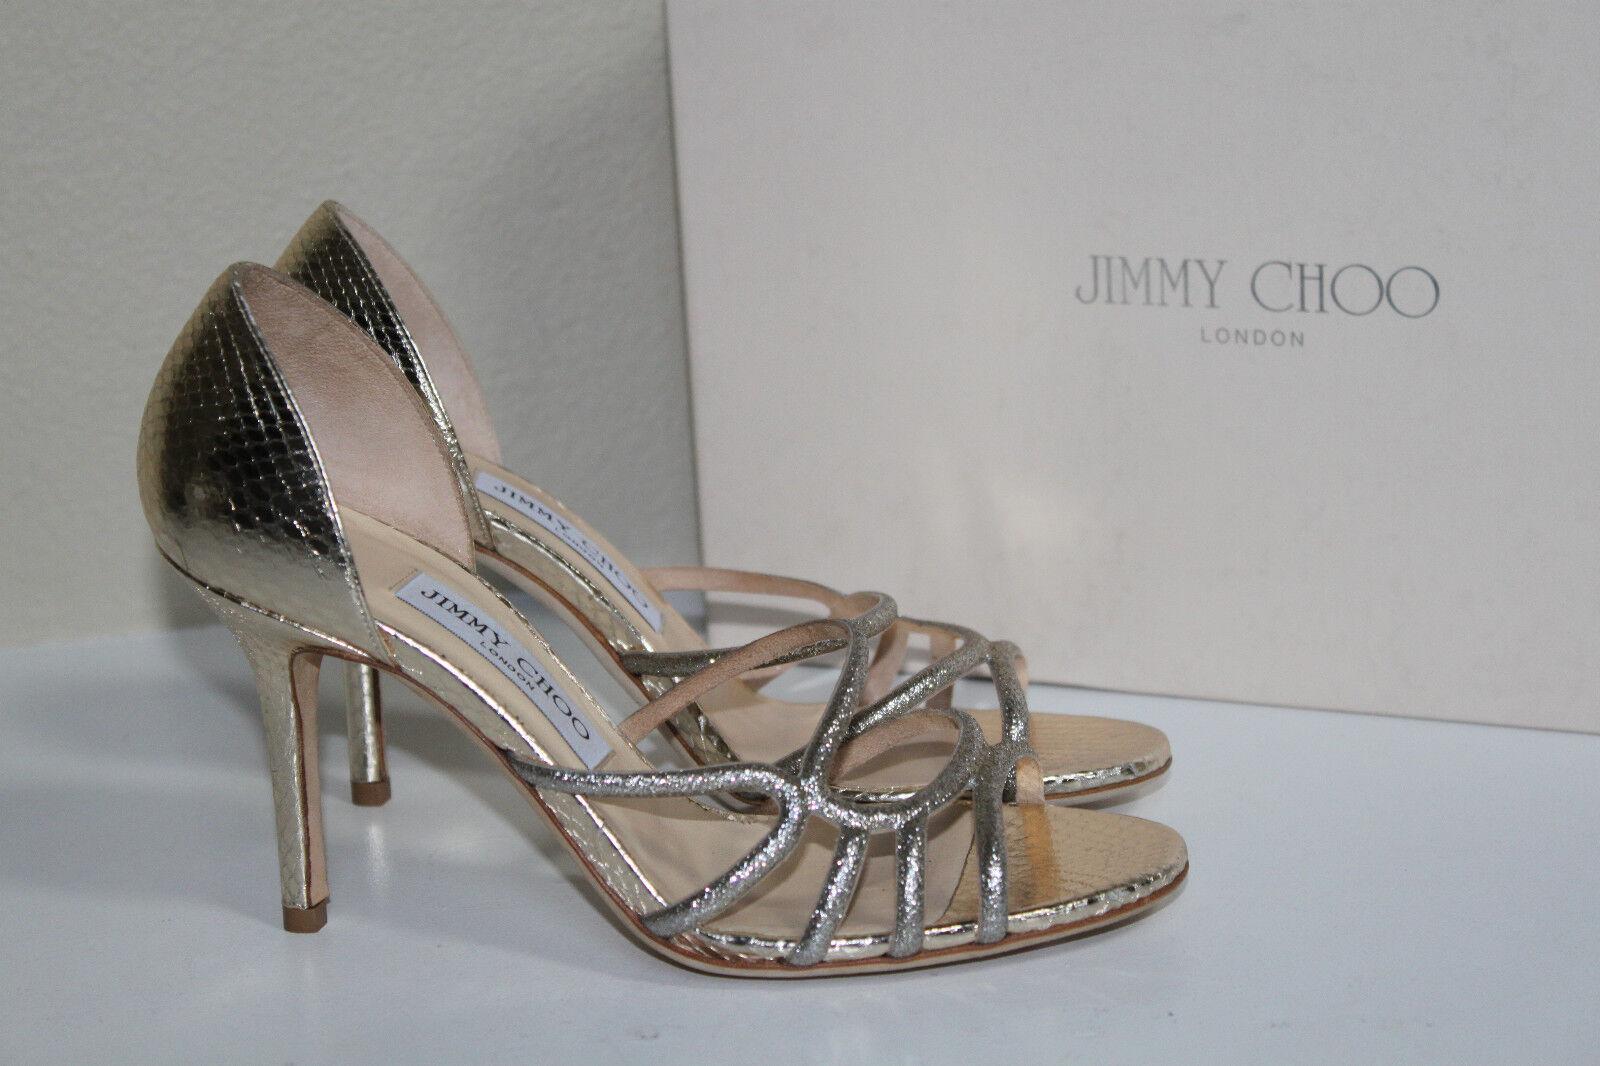 edizione limitata a caldo New sz sz sz 8.5   38.5 Jimmy Choo Straits oro Leather Open Toe Sandal Heel scarpe  sport dello shopping online